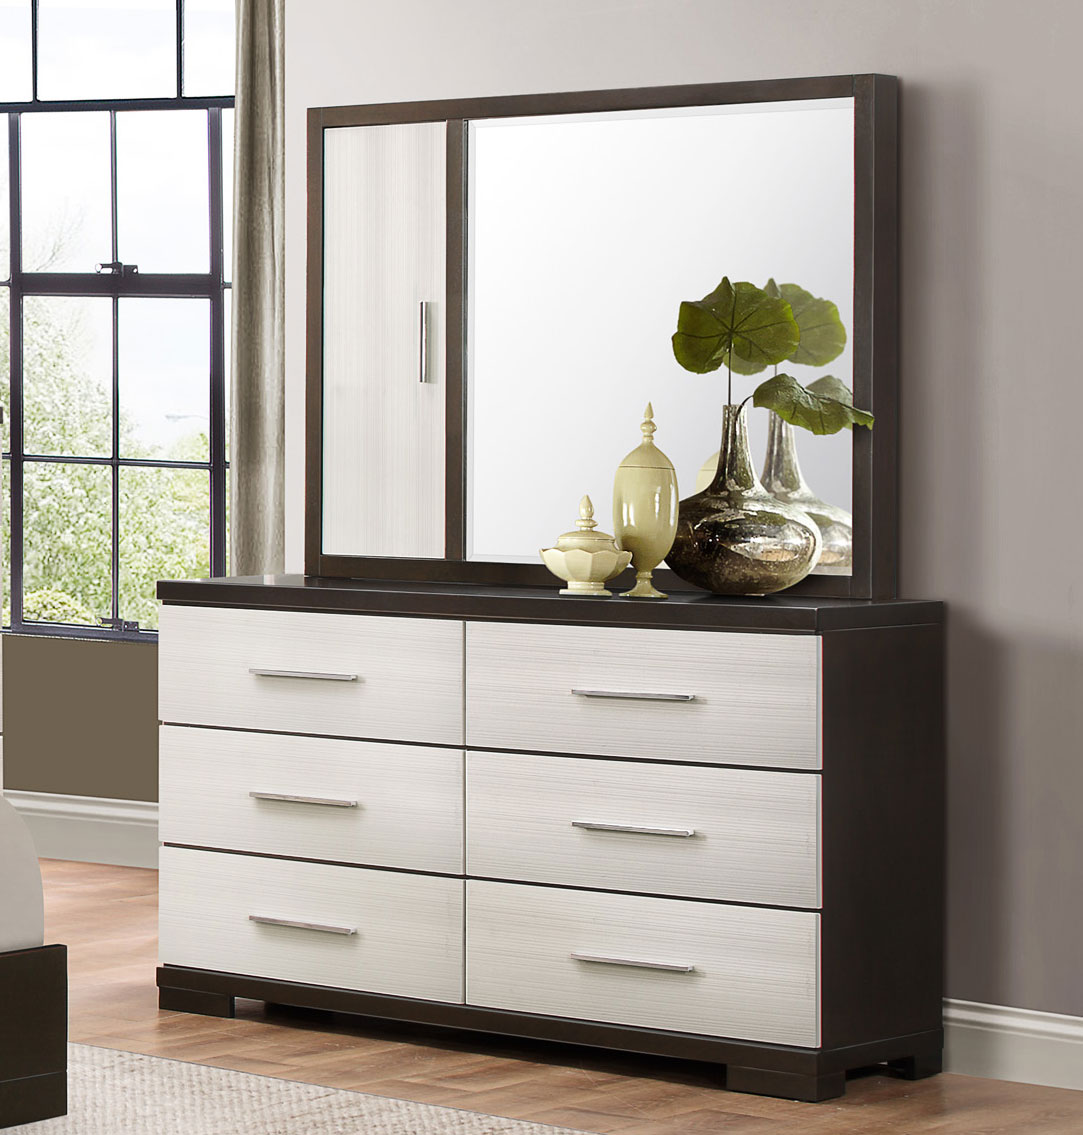 Homelegance Pell Dresser - Two-tone Espresso/White